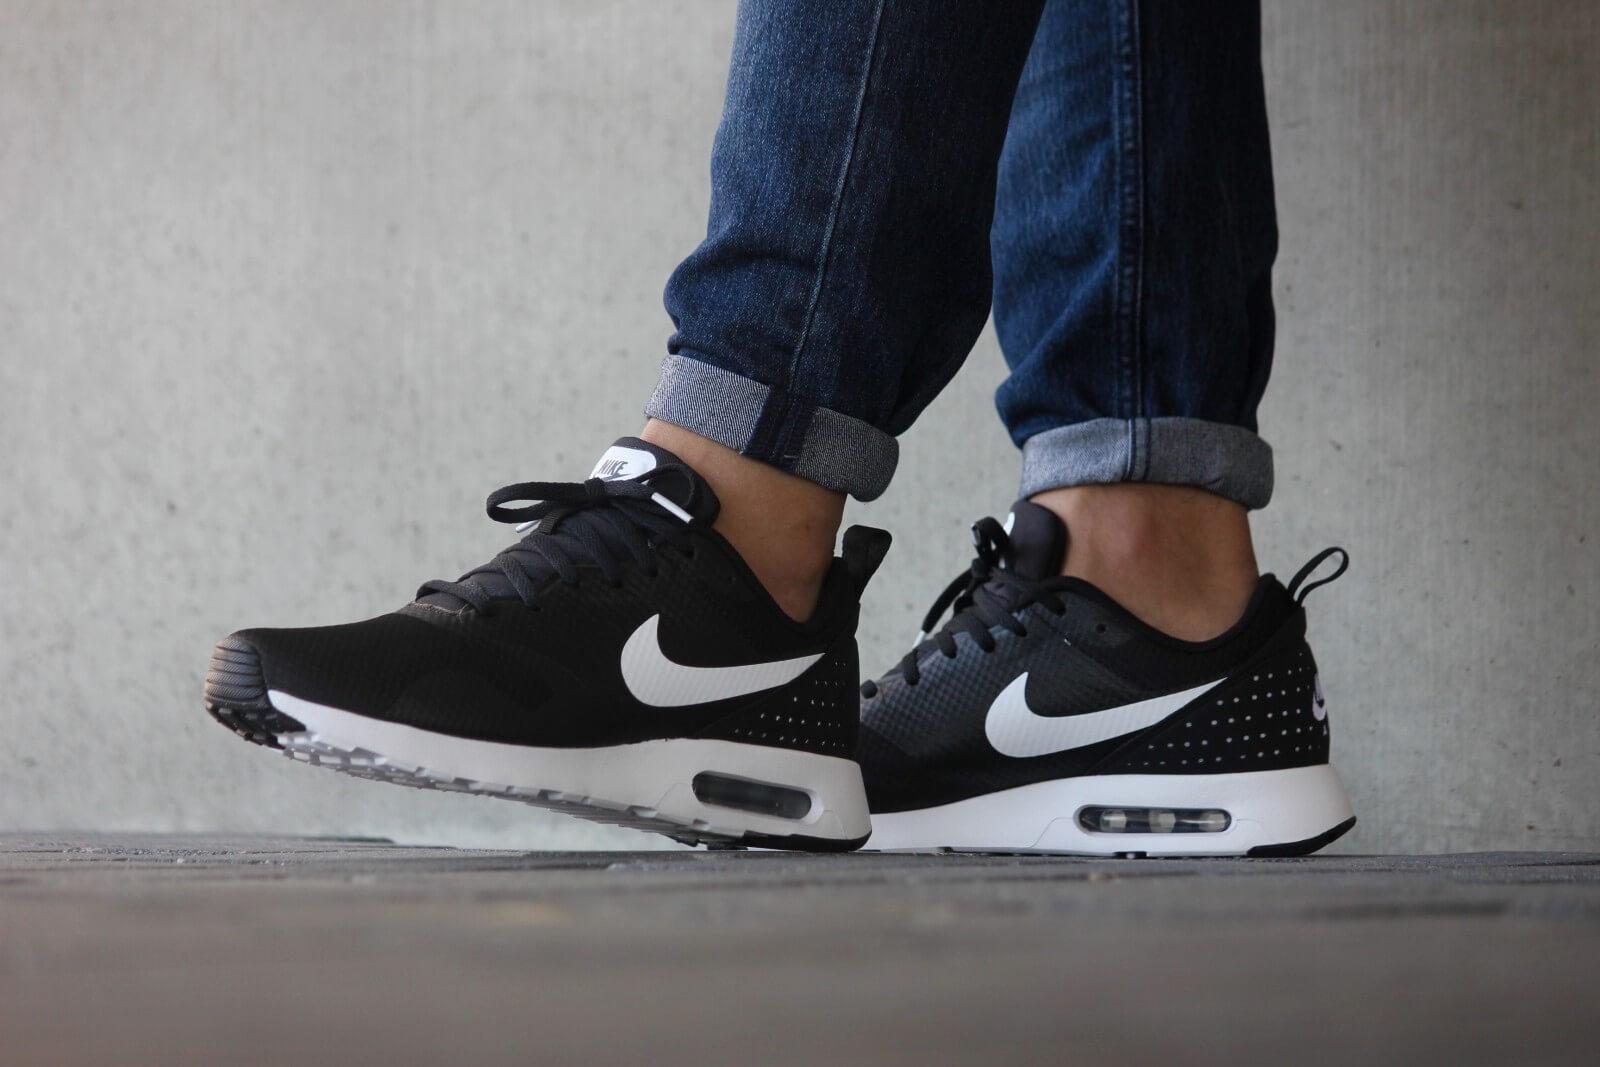 Nike Air Max Tavas Black White Black 705149 009